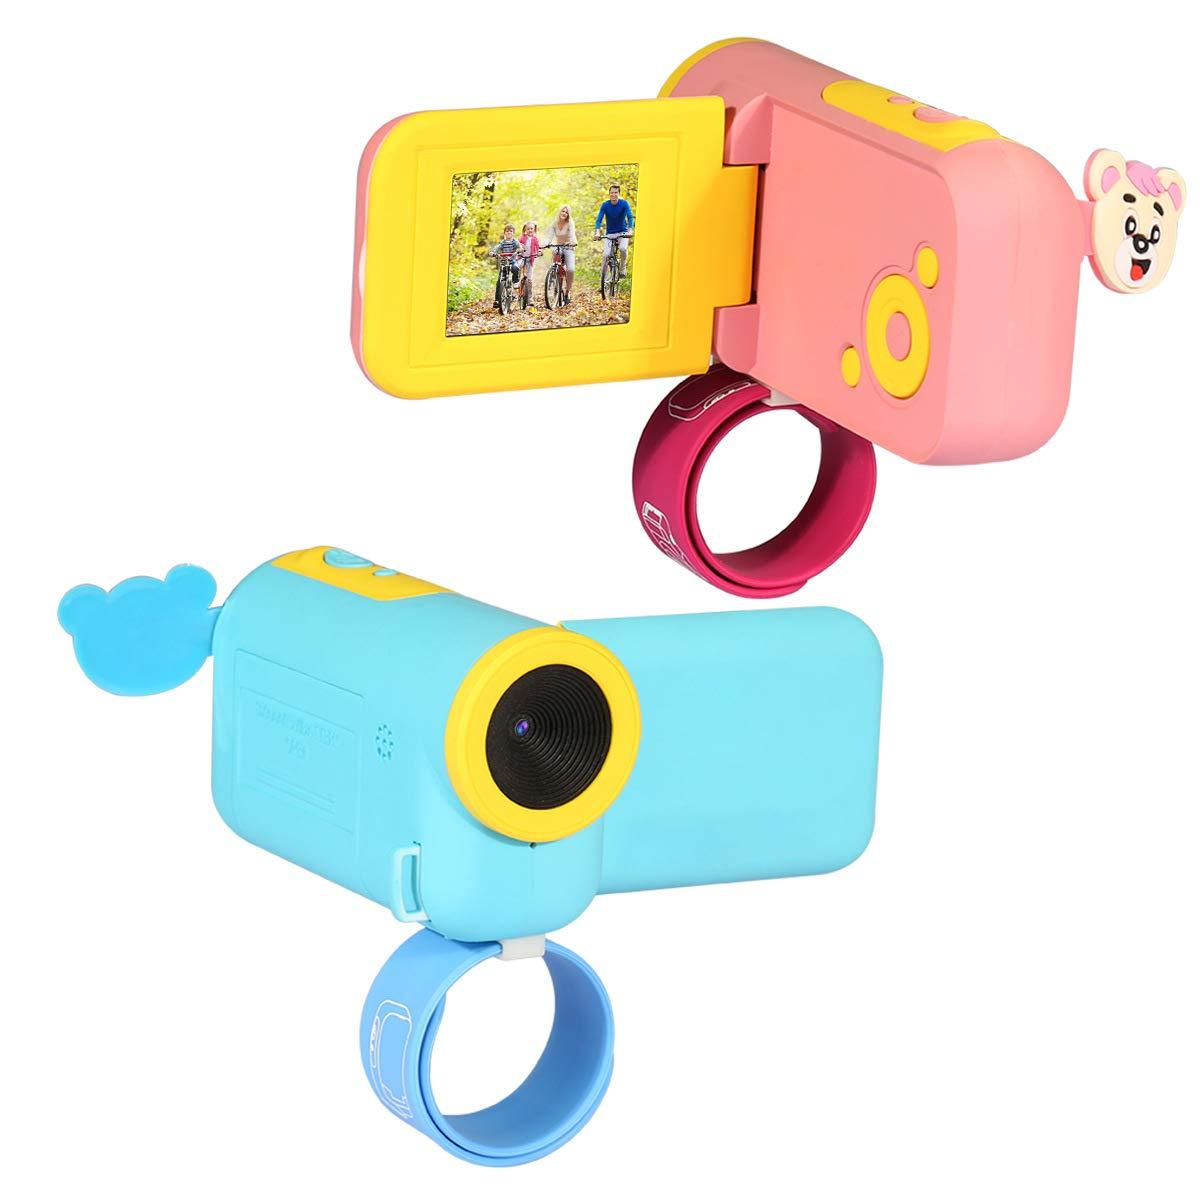 MeterMall Mini Puzzle Cartoon Cameras HD Children's Toy Digital Camera Sky Blue by MeterMall (Image #9)